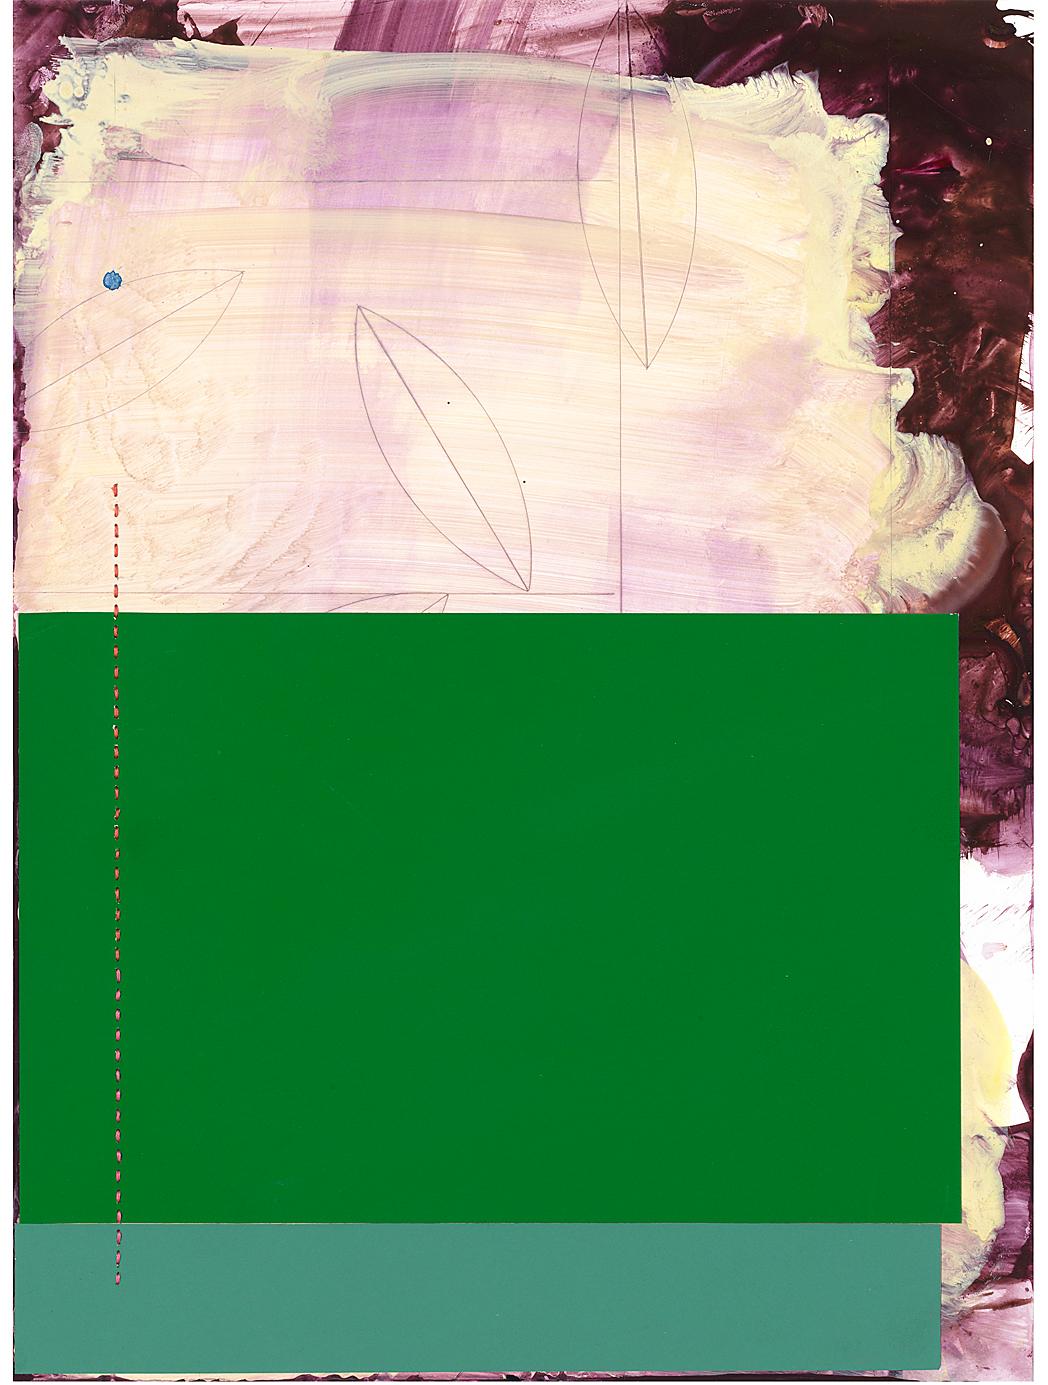 Paperwork, o.T., mixed media, 33 x 25 cm